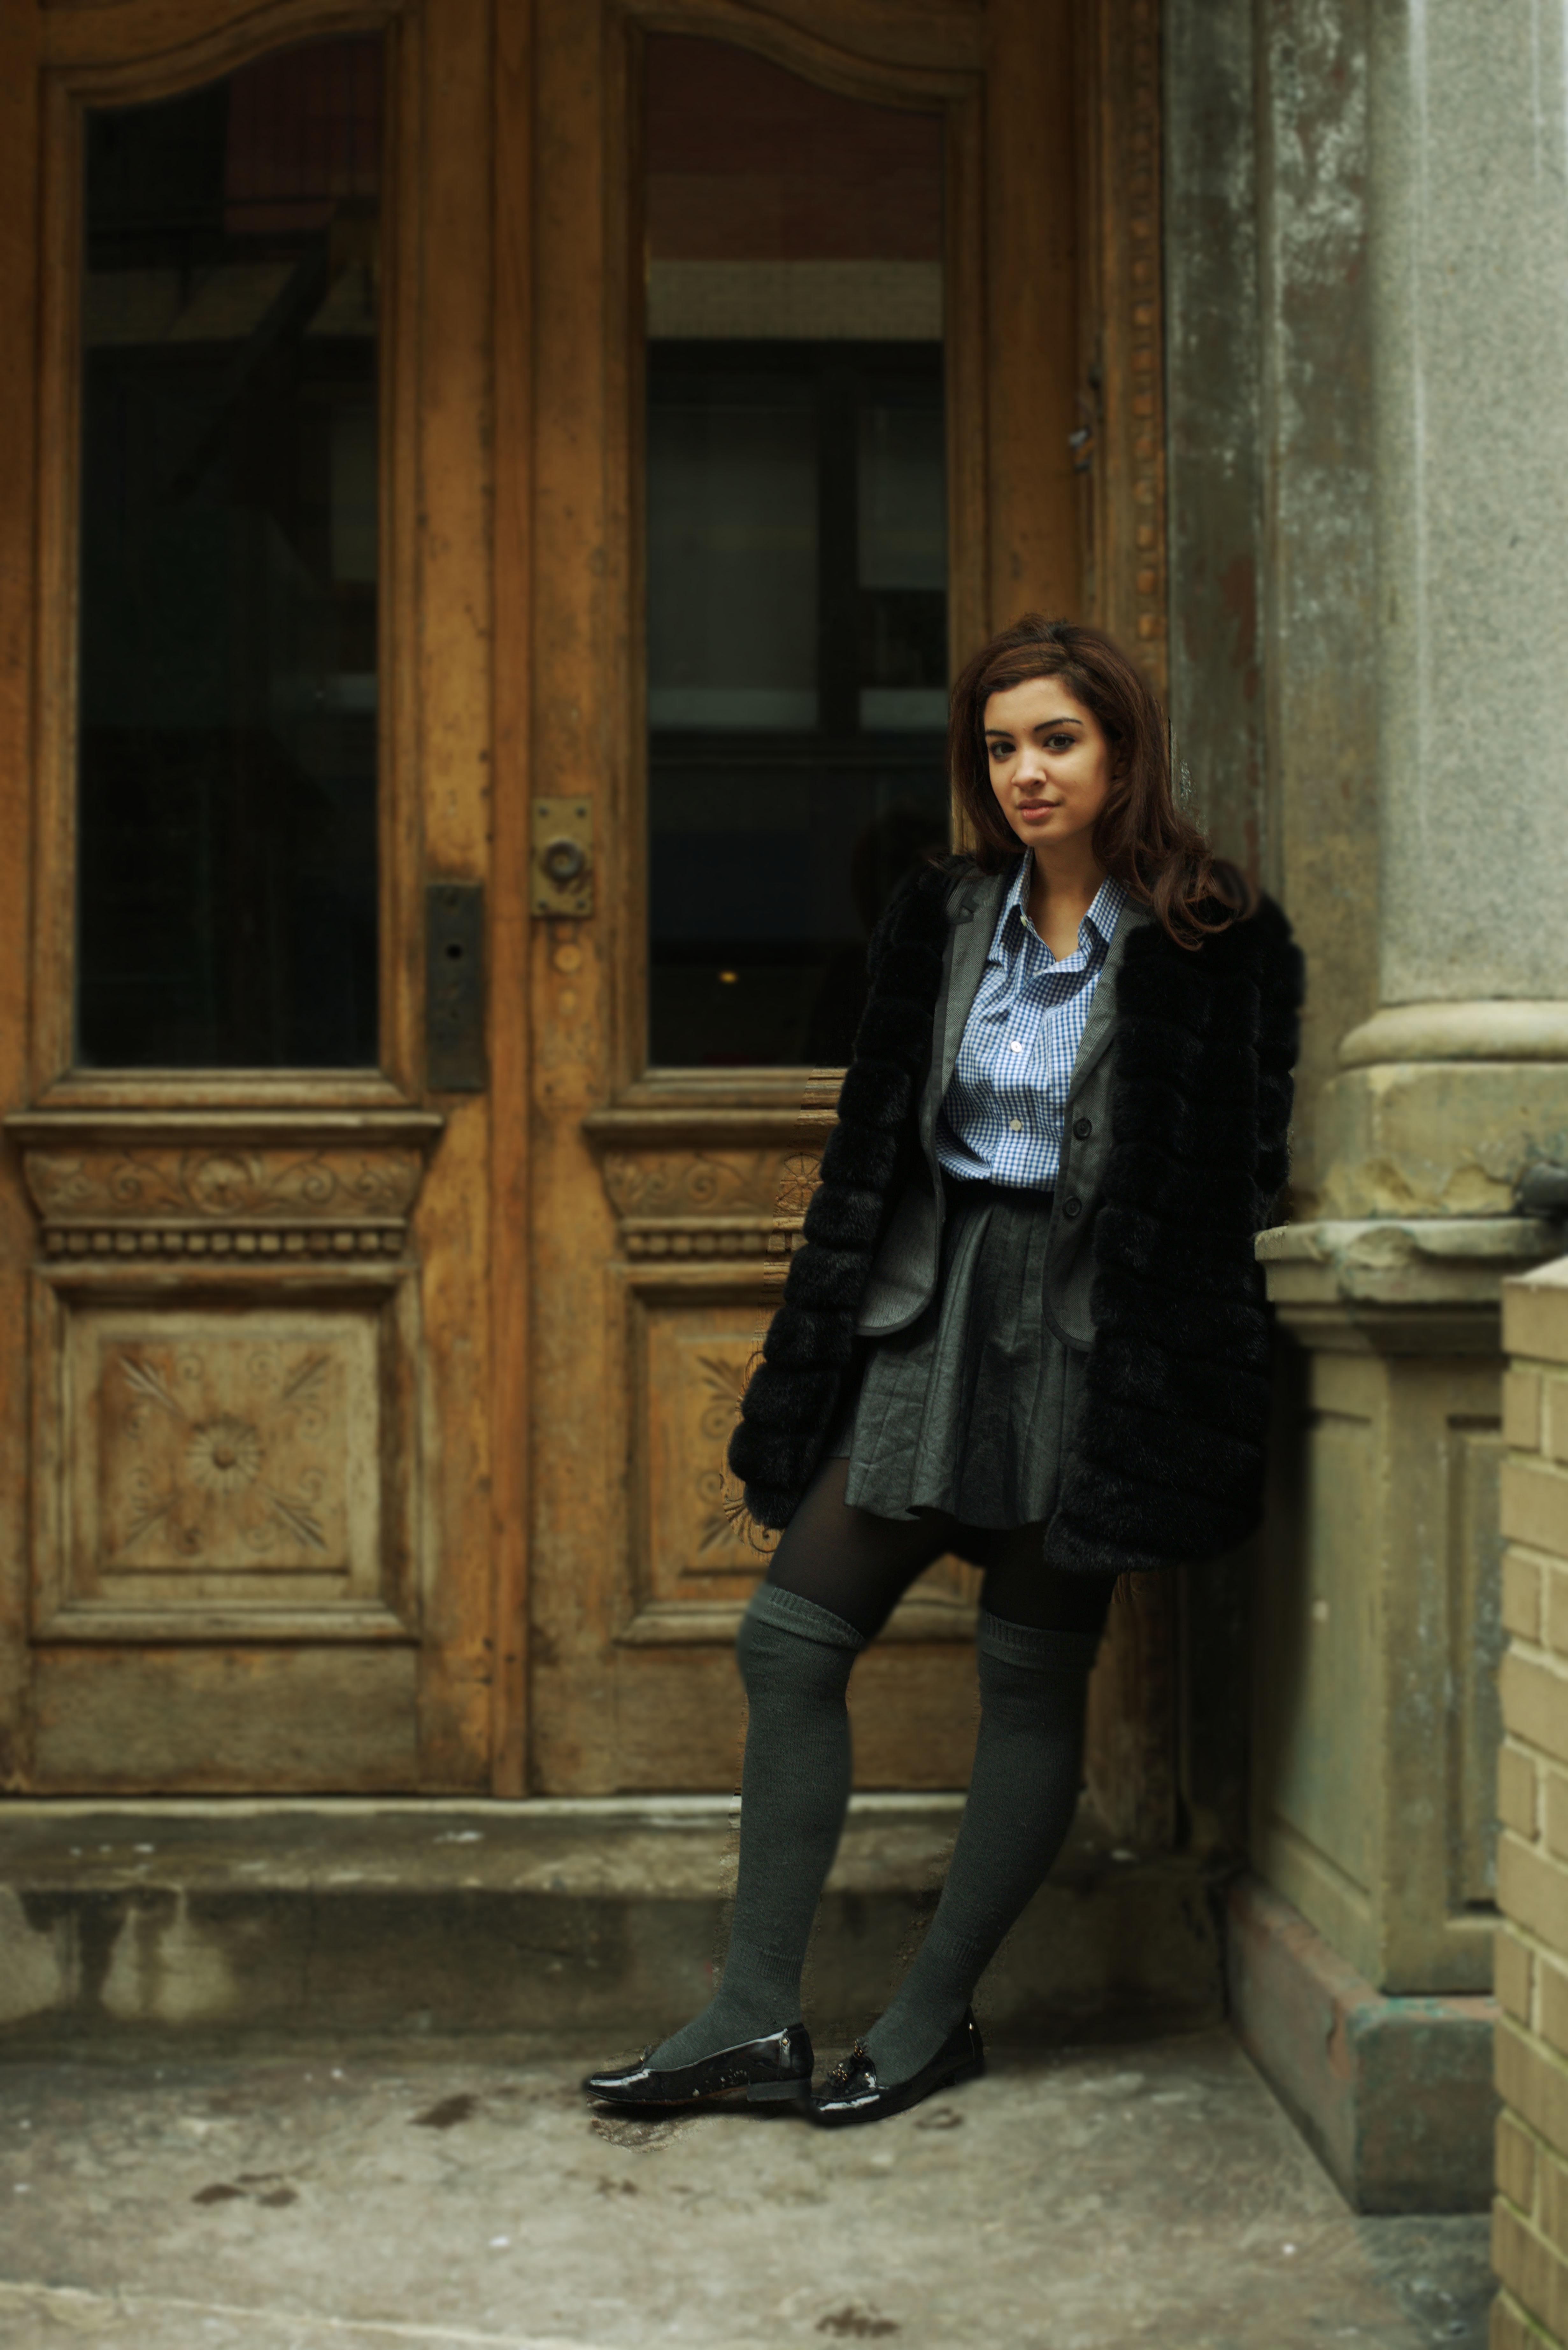 Hot girl from school-9810